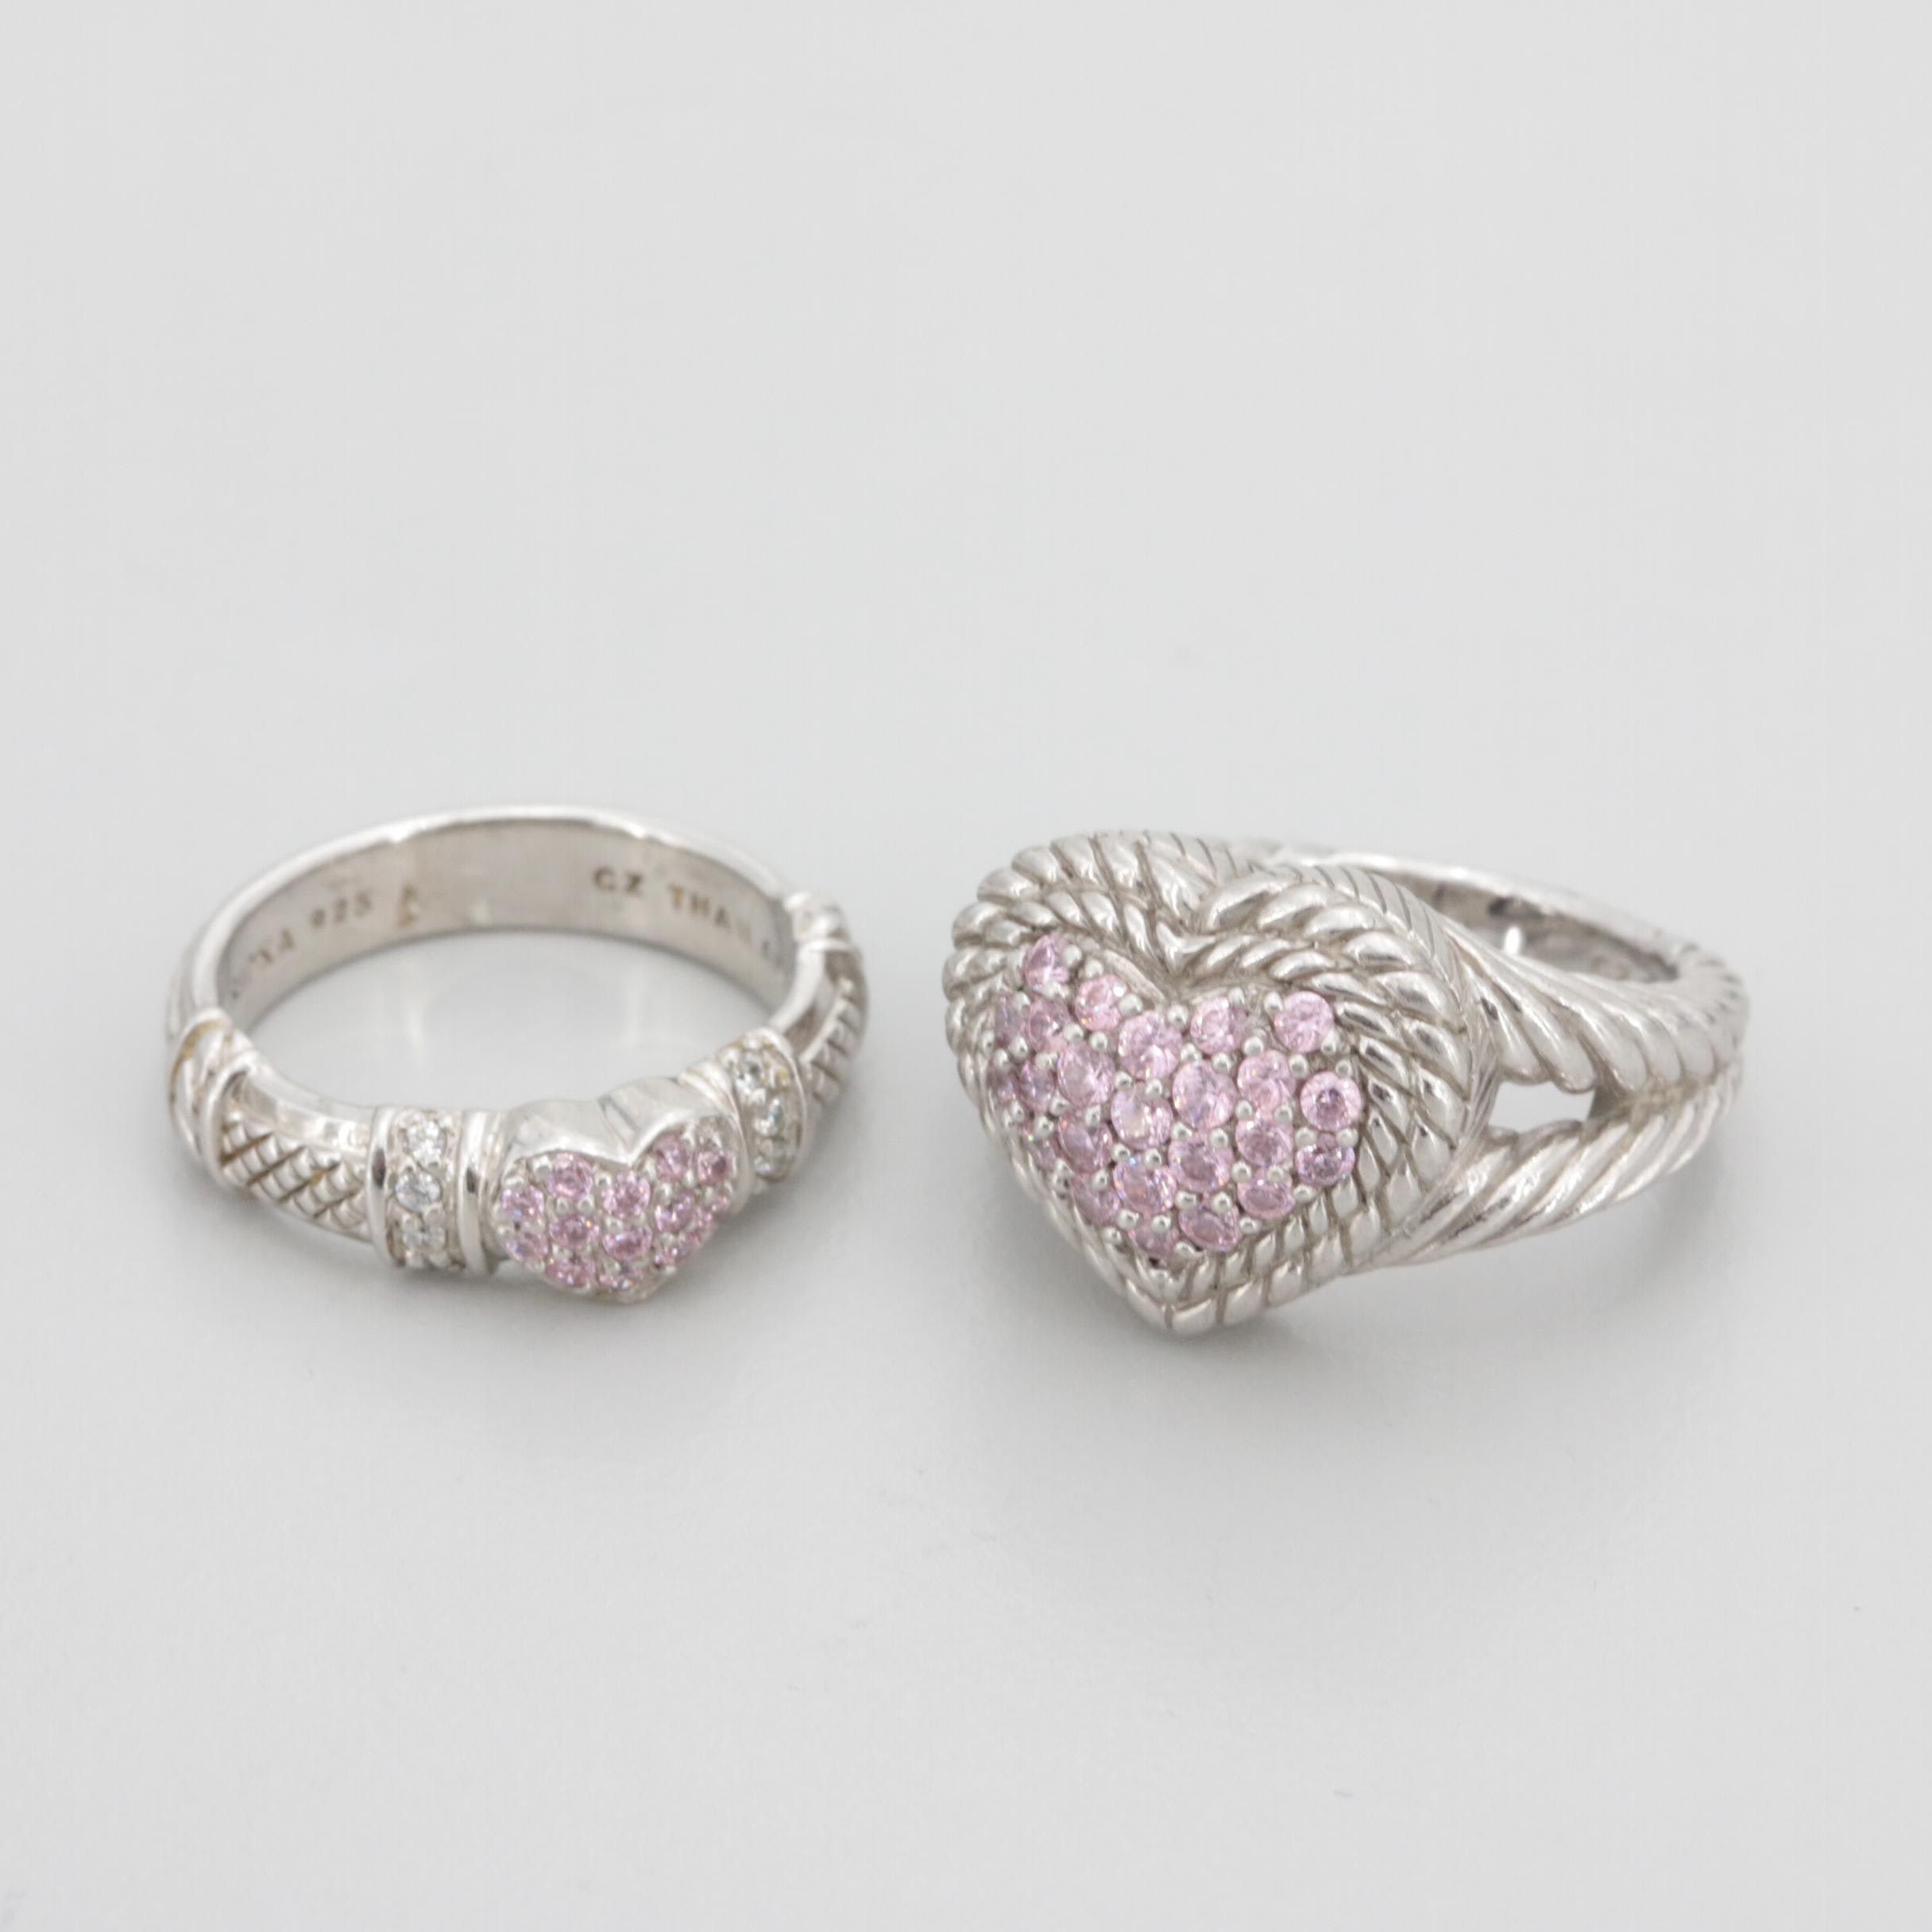 Judith Ripka Sterling Silver Cubic Zirconia Heart Rings